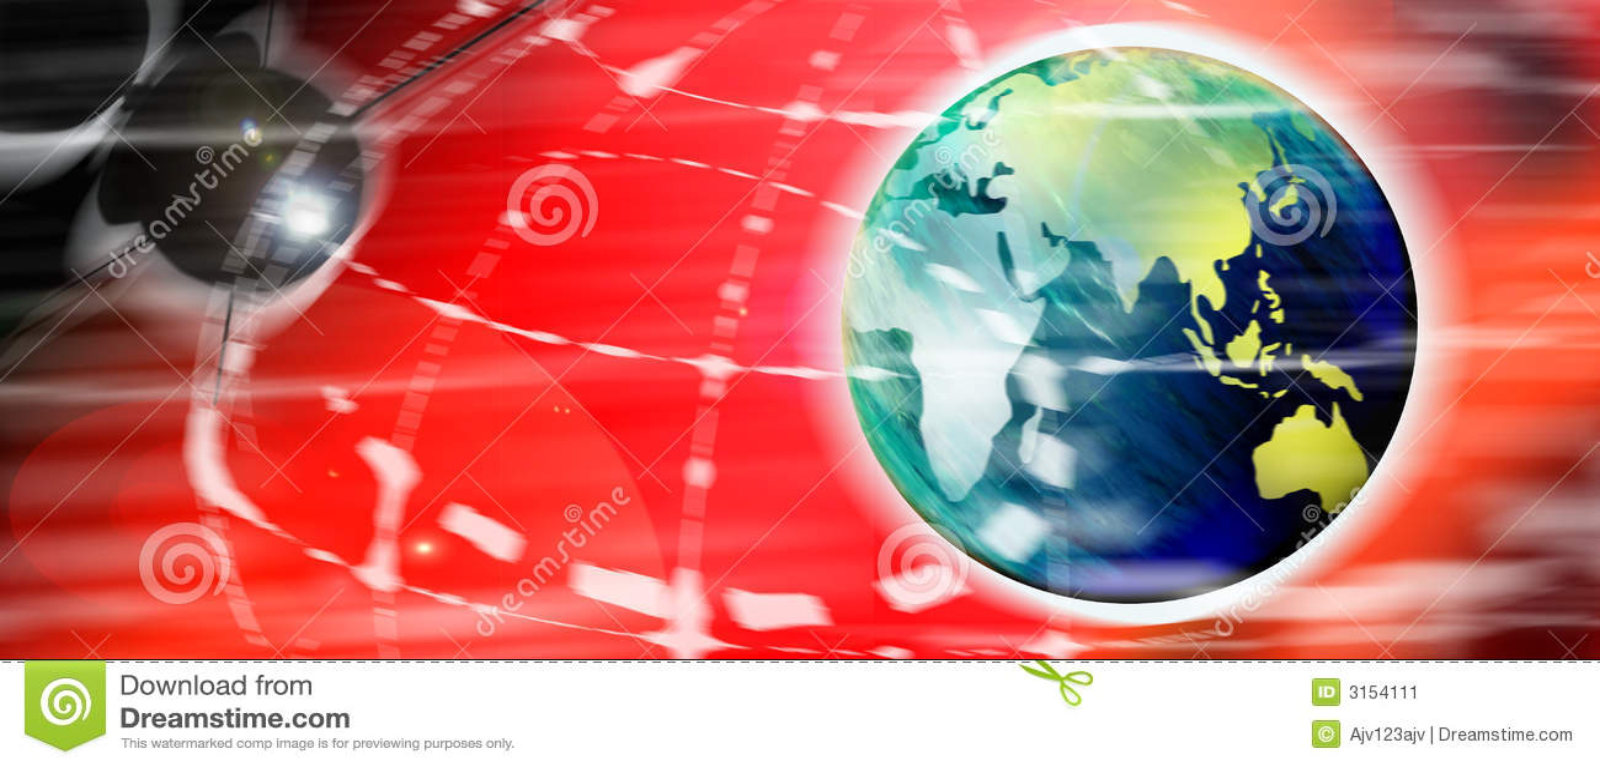 Digital world and satellite